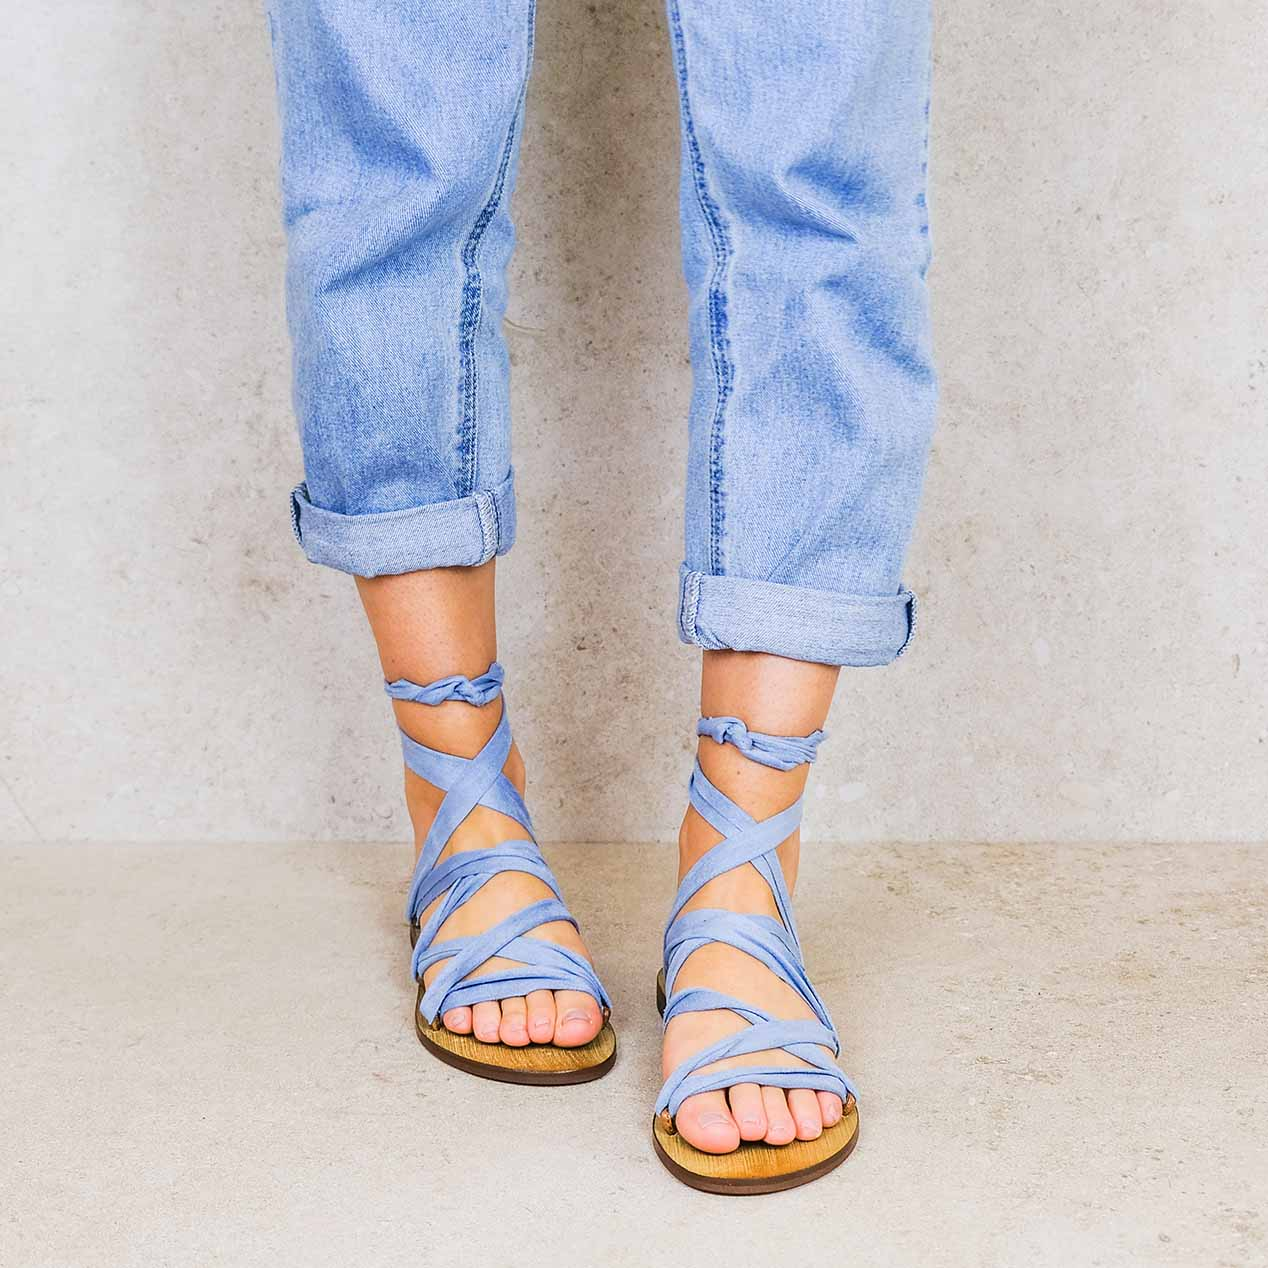 Baby-blue_suede ribbons linten lintsandalen sandals travelsandals vegan sustainable sandals wikkelsandalen